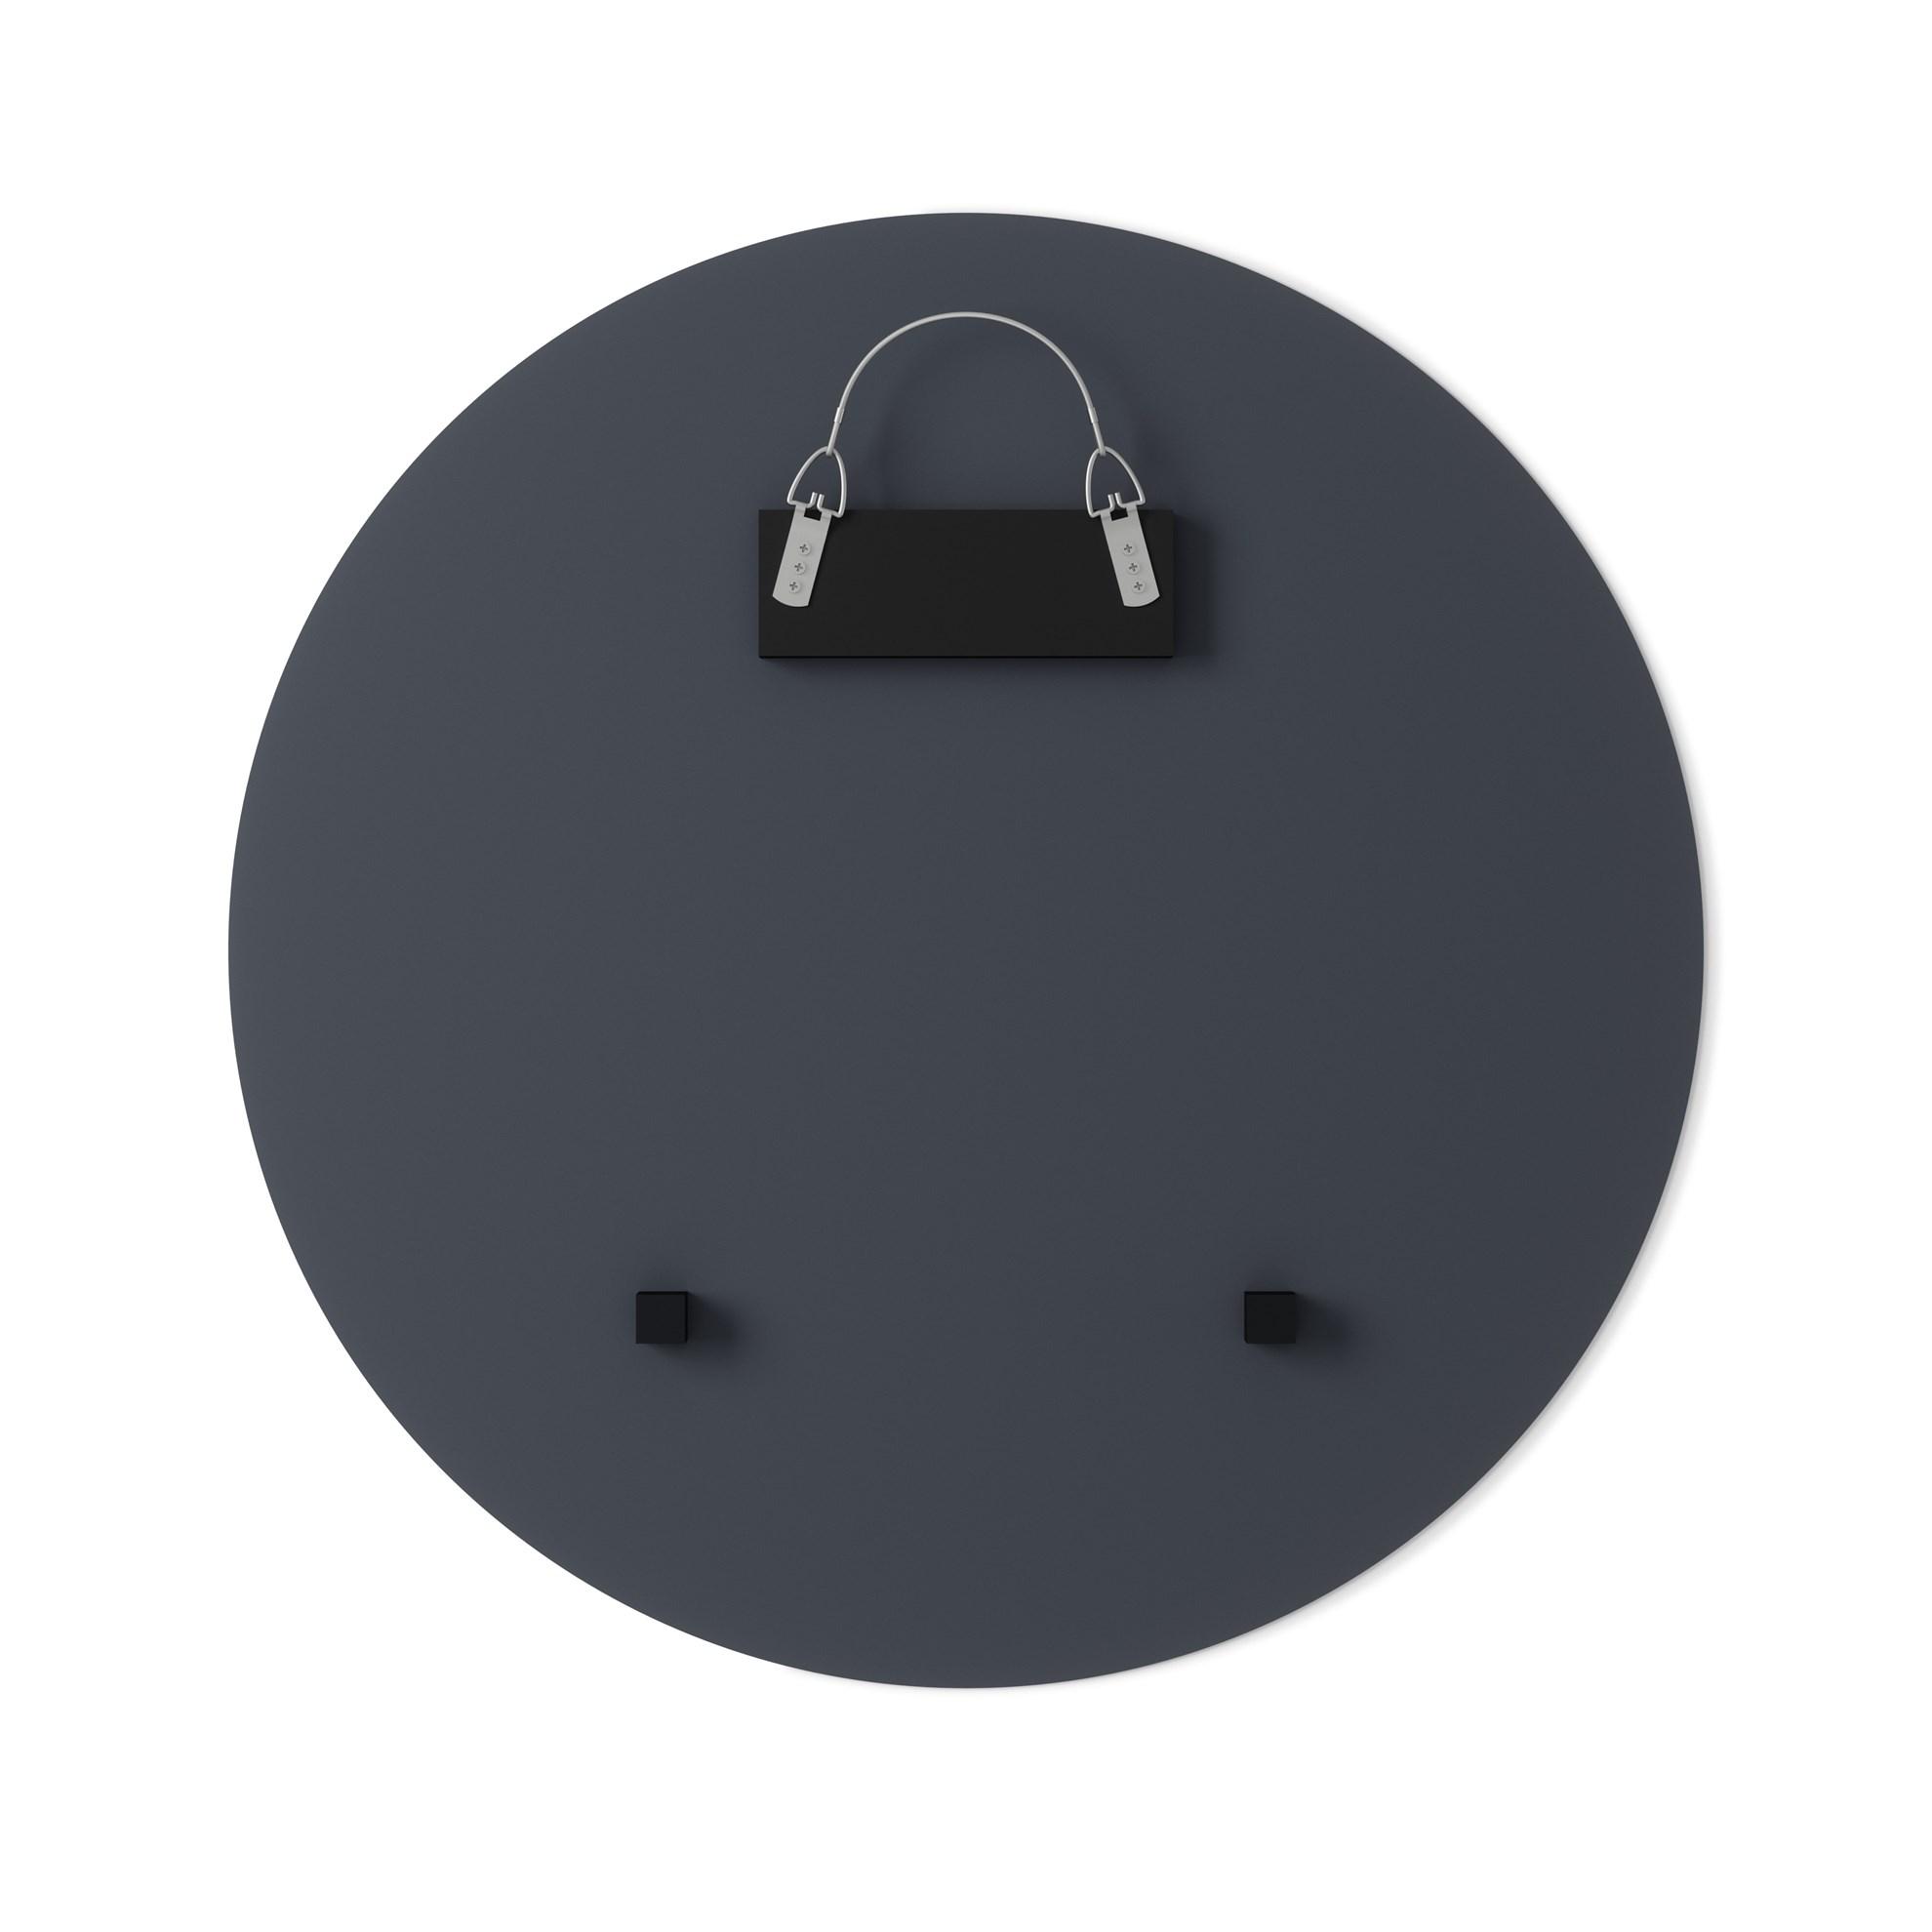 Zrcadlo HUB BEVY 61 cm měděné_0